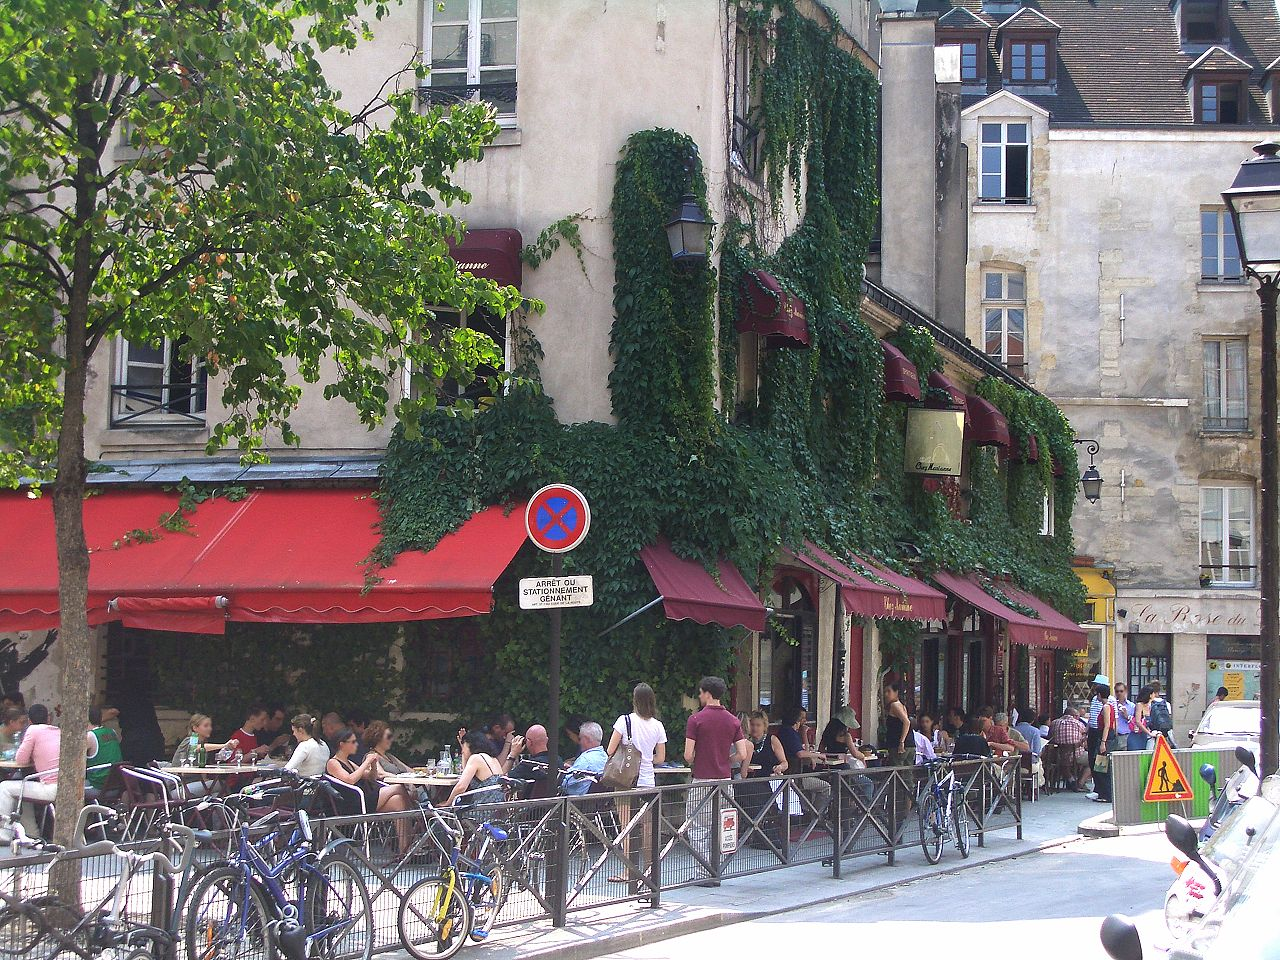 Chez Gervais Restaurant Chennesey Buillon Avis